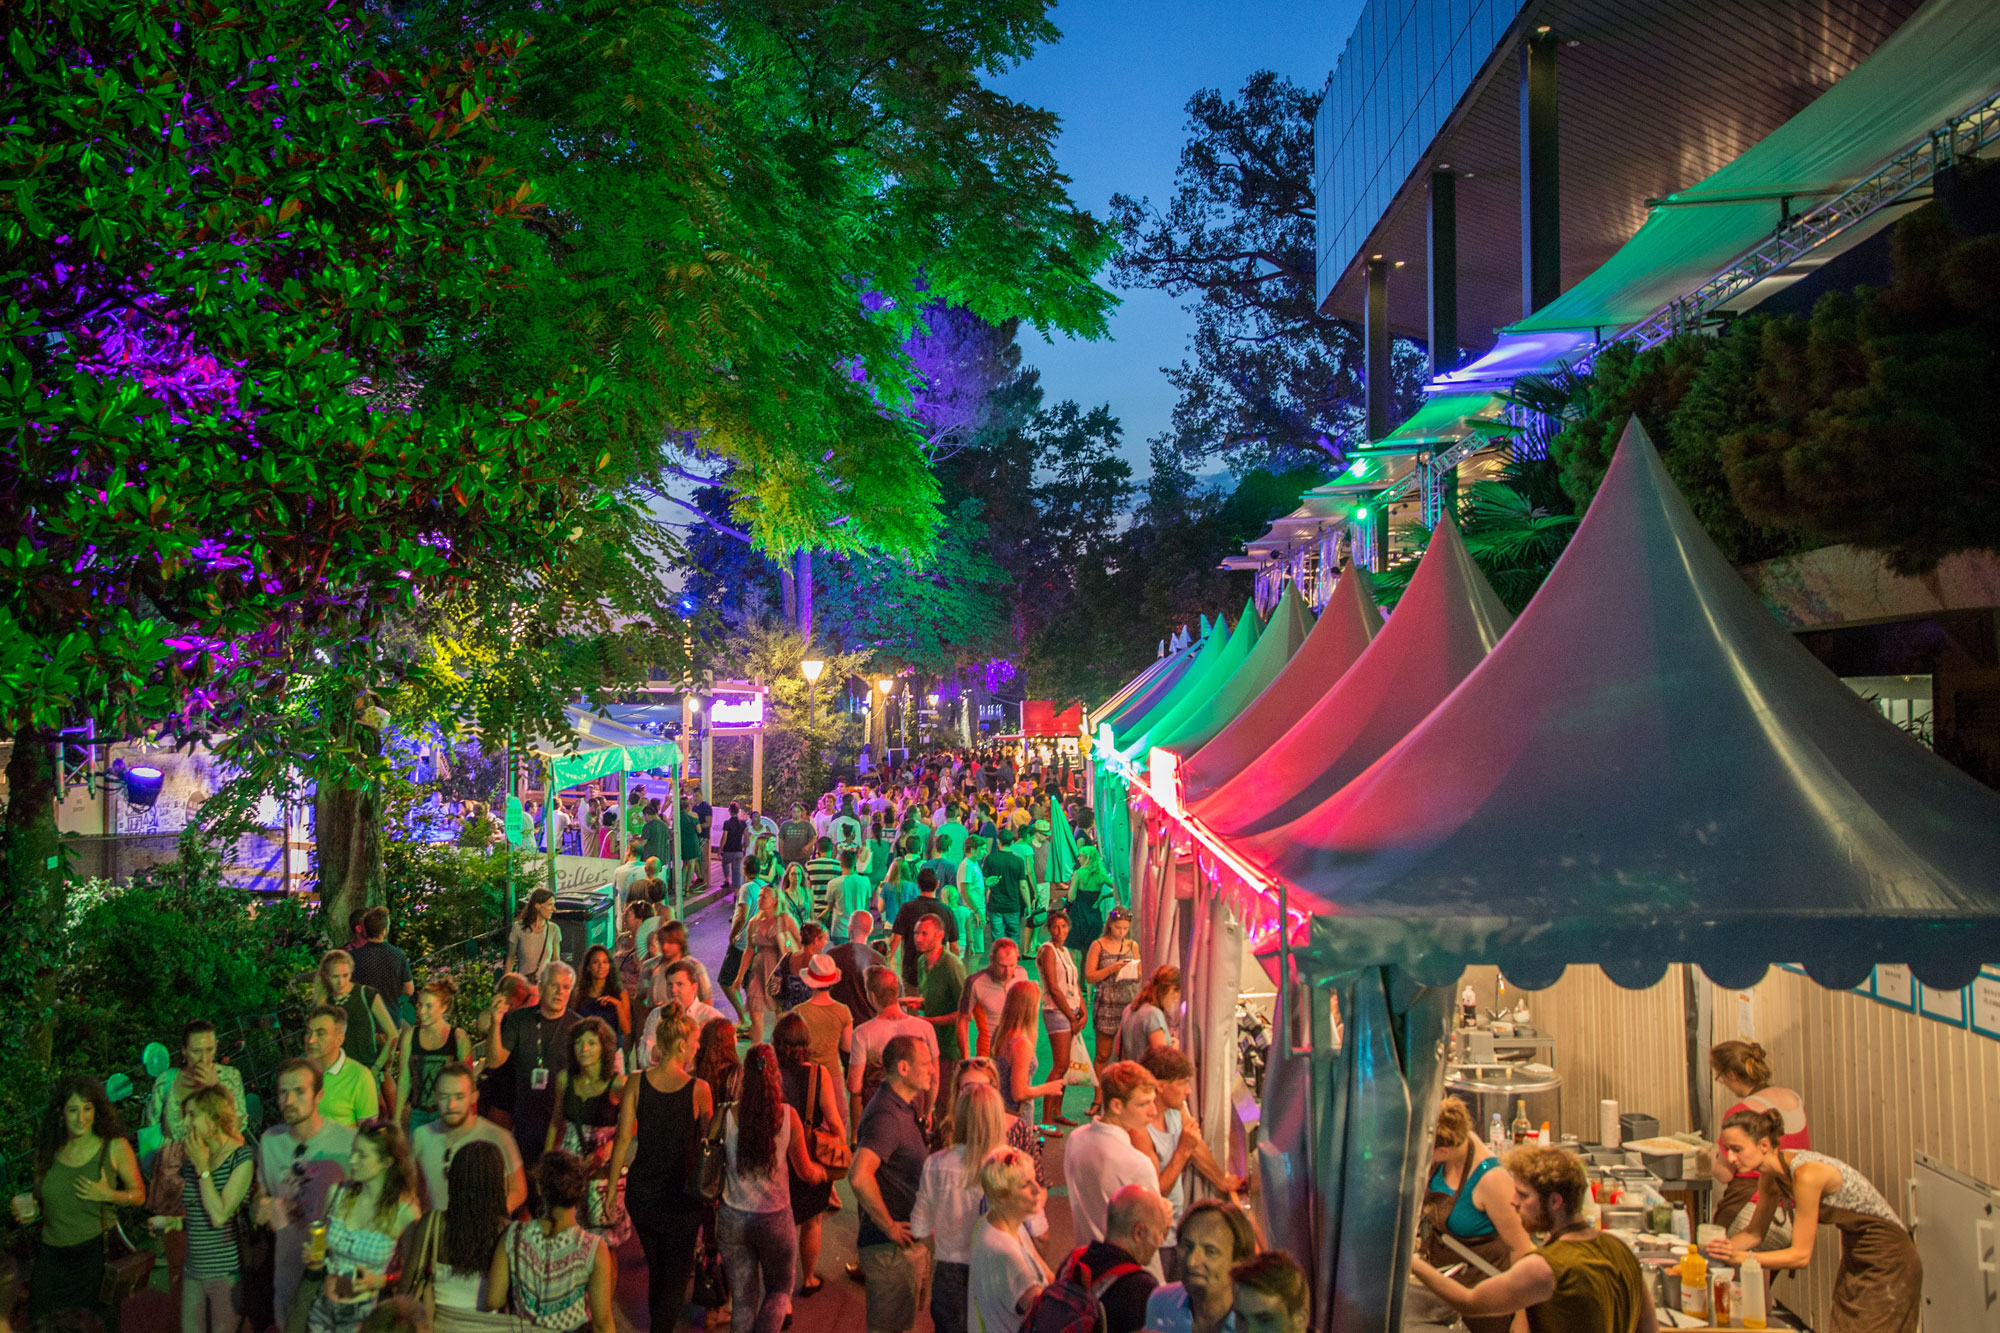 Montreux Jazz Festival 2015 >> The Montreux Jazz Festival - A Shrine For Musicians - Luxurious Magazine